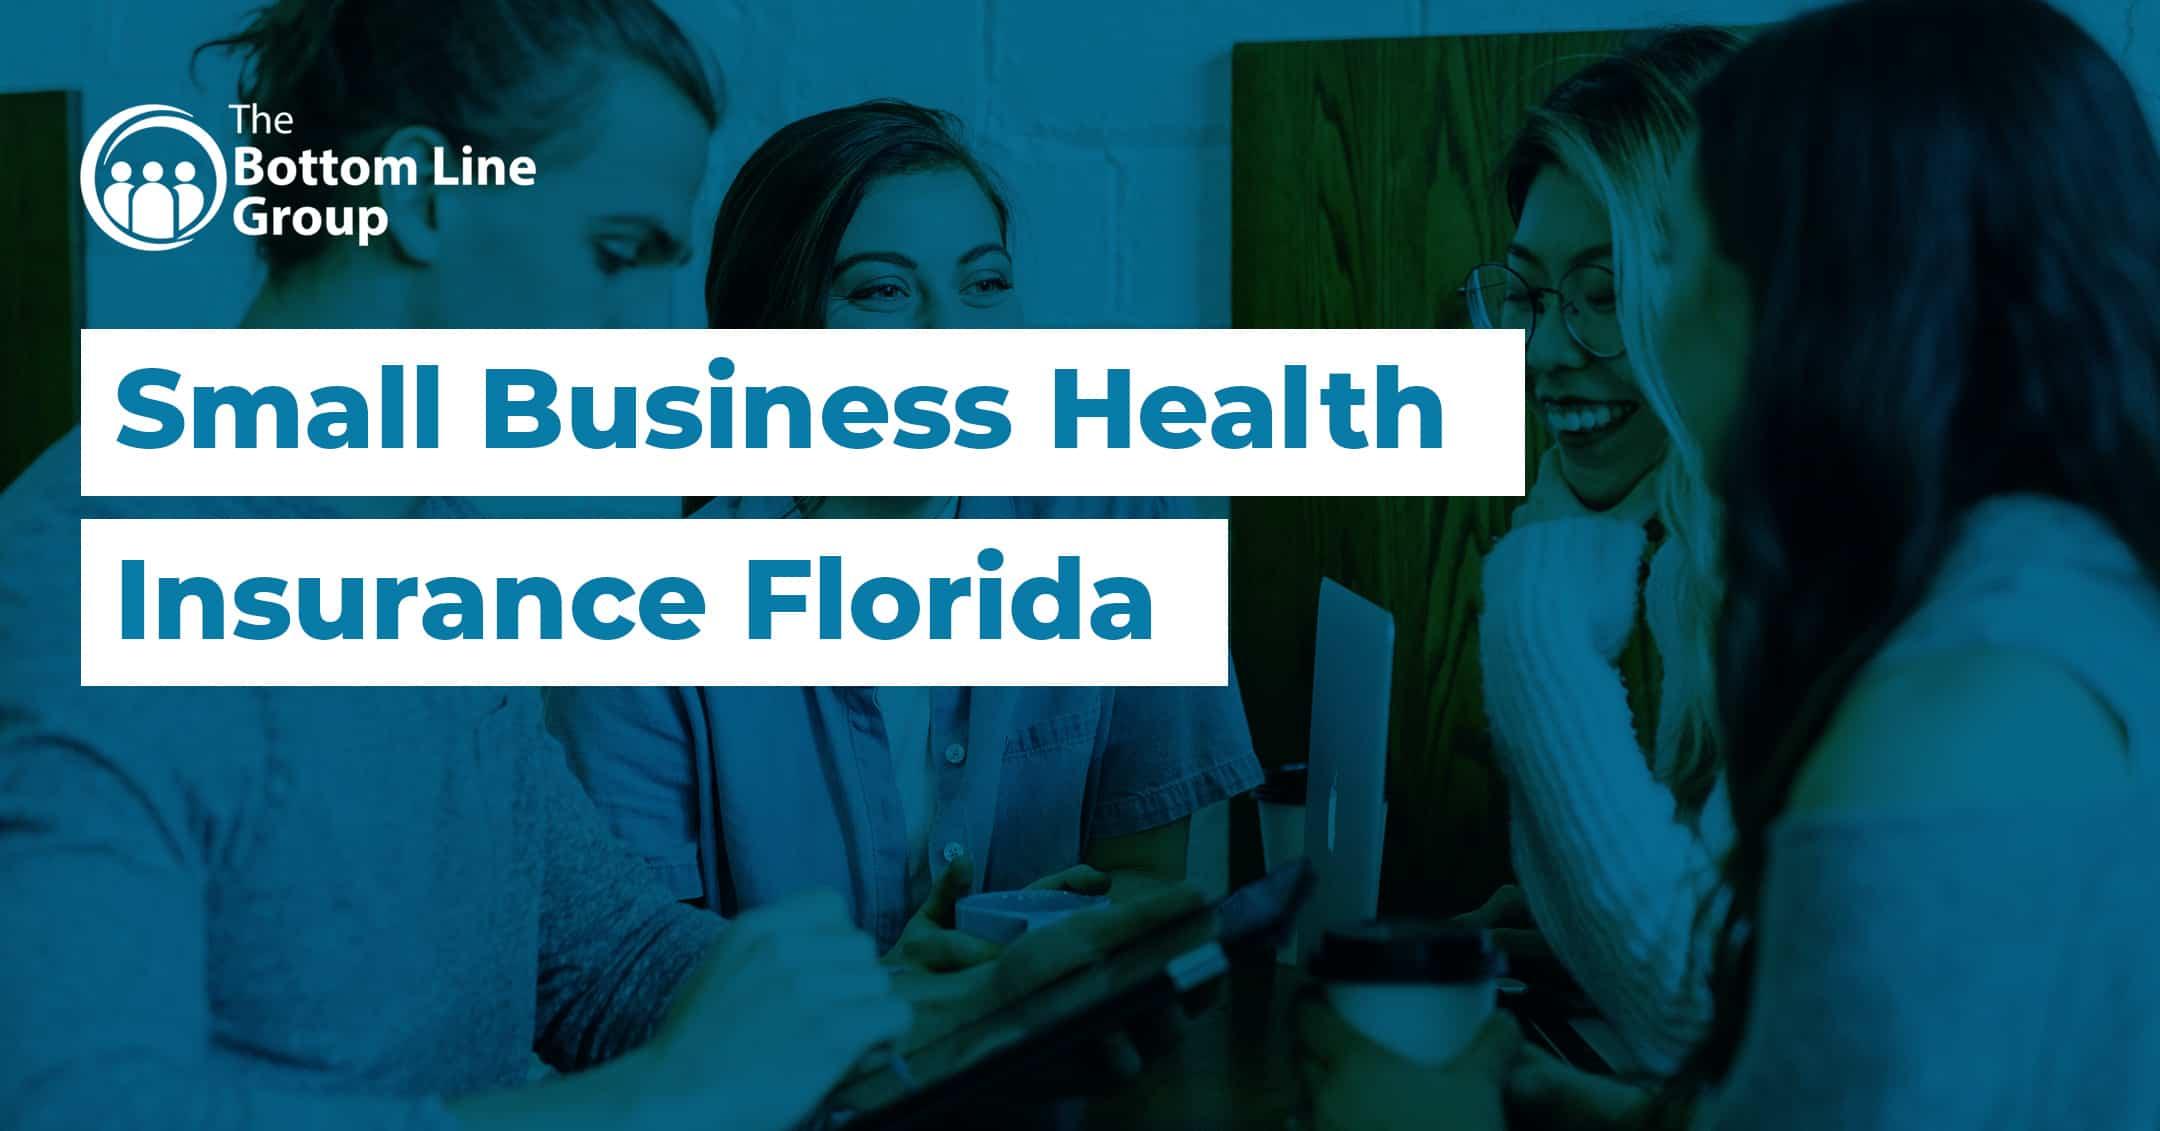 52-(Small-Business-Health-Insurance-Florida)1